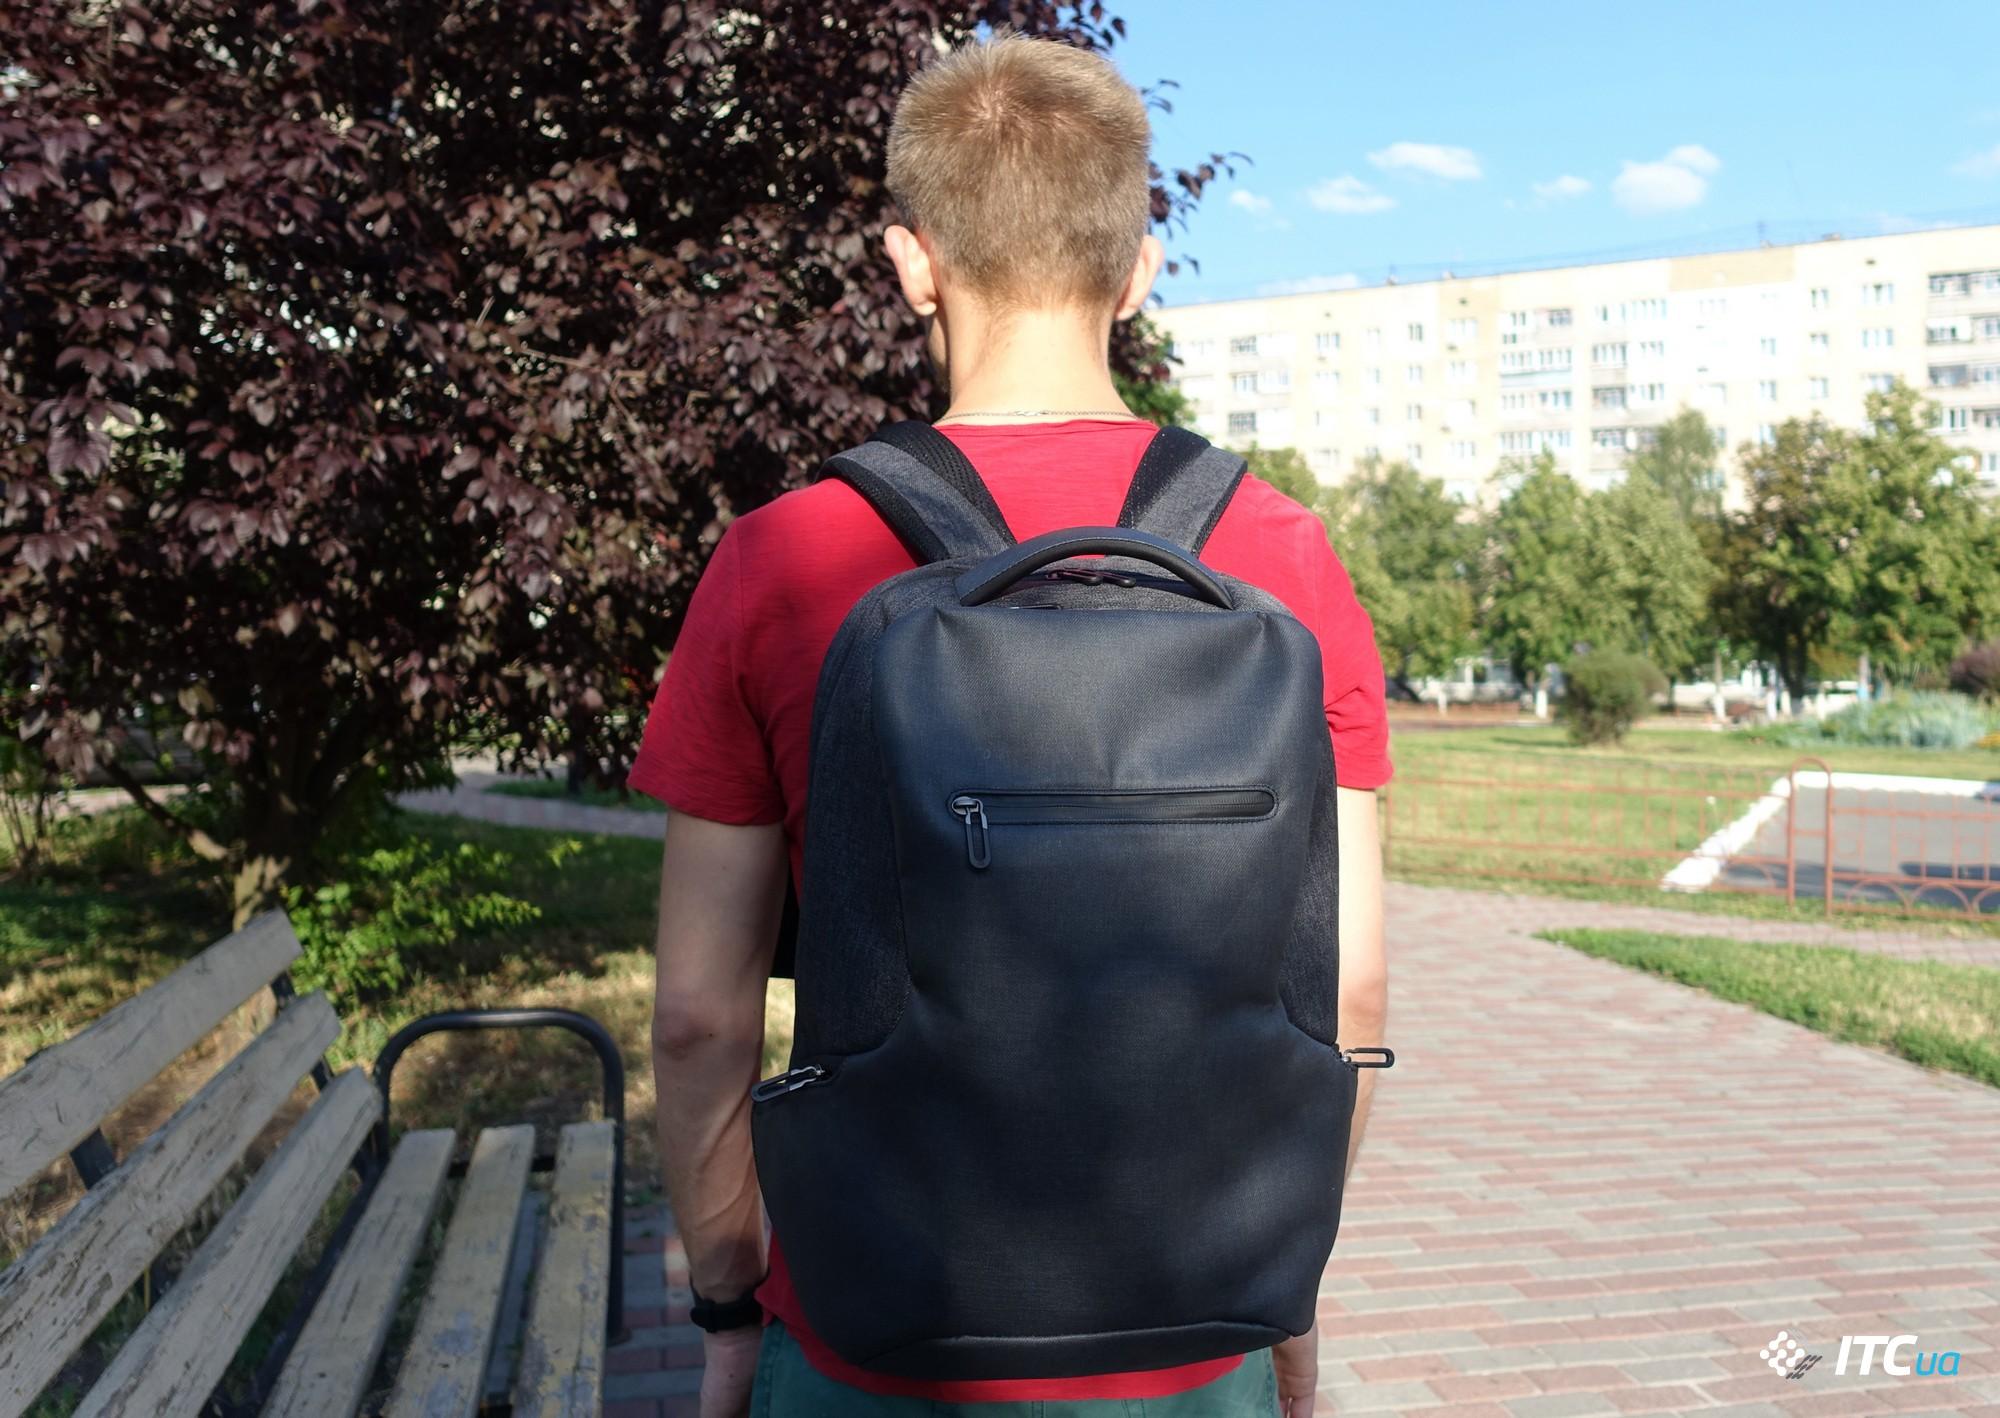 c5e6931a33c6 Все от Xiaomi  2  обзор рюкзака Mi Classic Business Multi-functional  Shoulder Bag